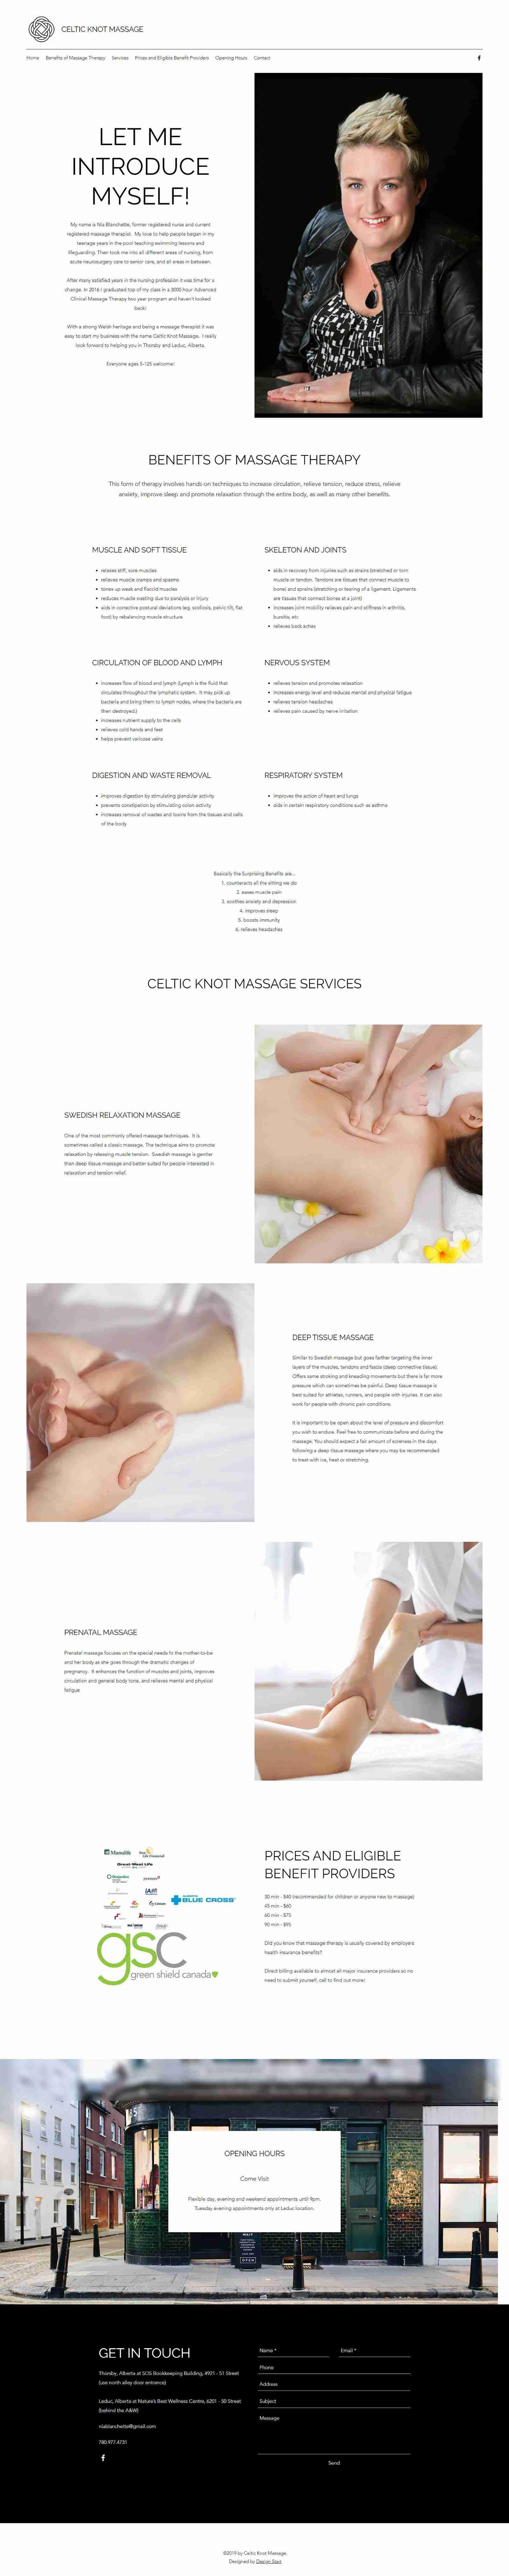 One Page Web Design Celtic Knot Massage